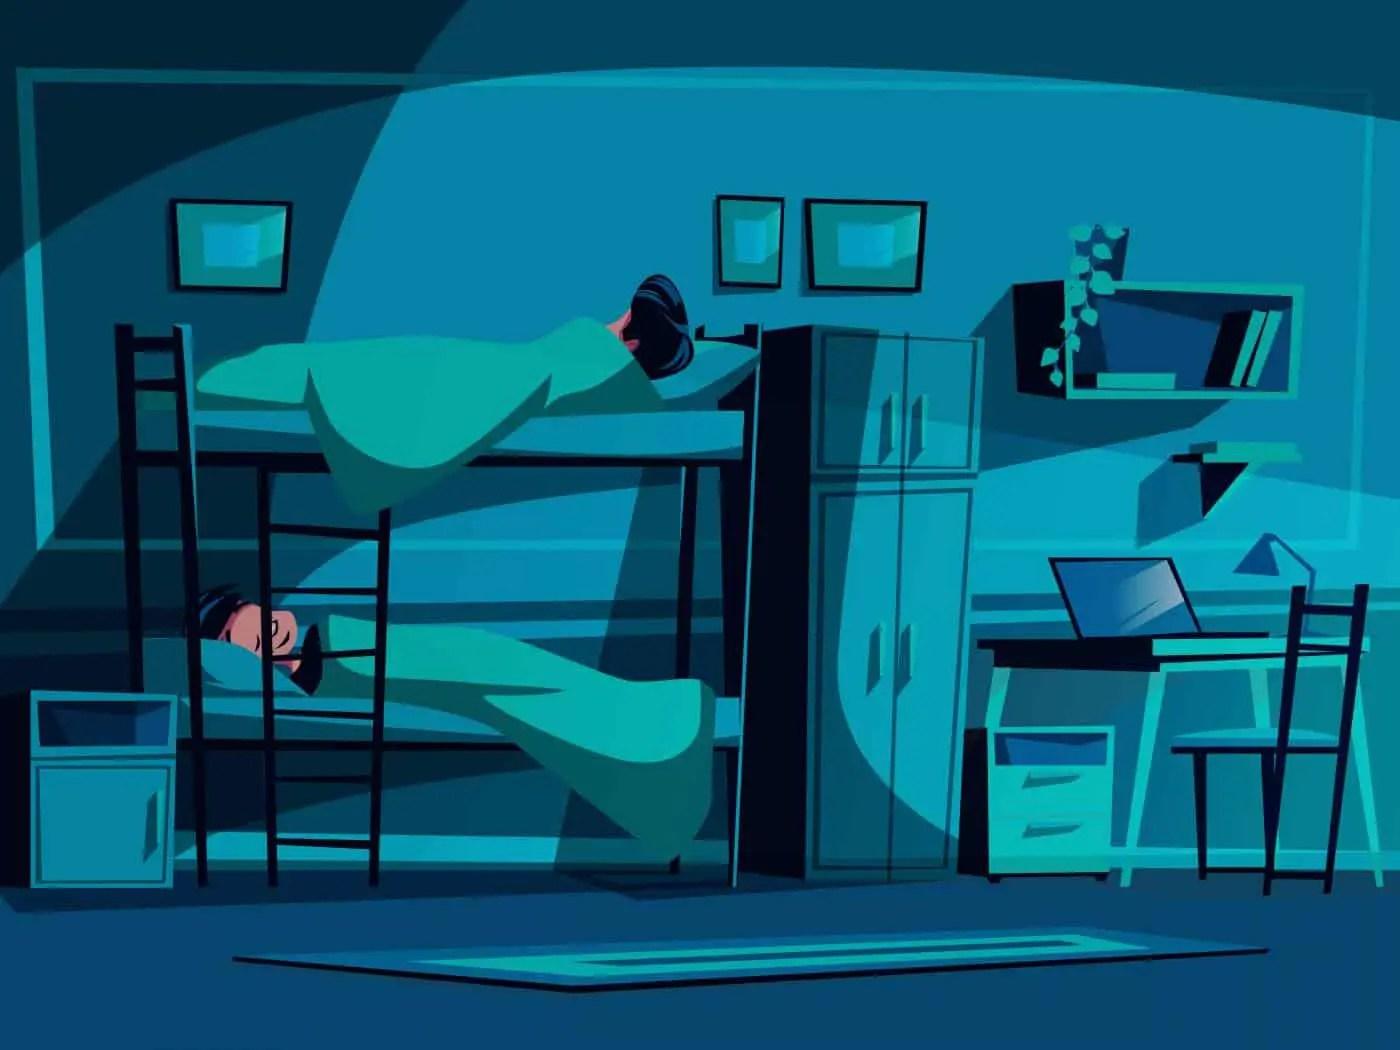 Hostel Rule: Respect Lights out in hostel